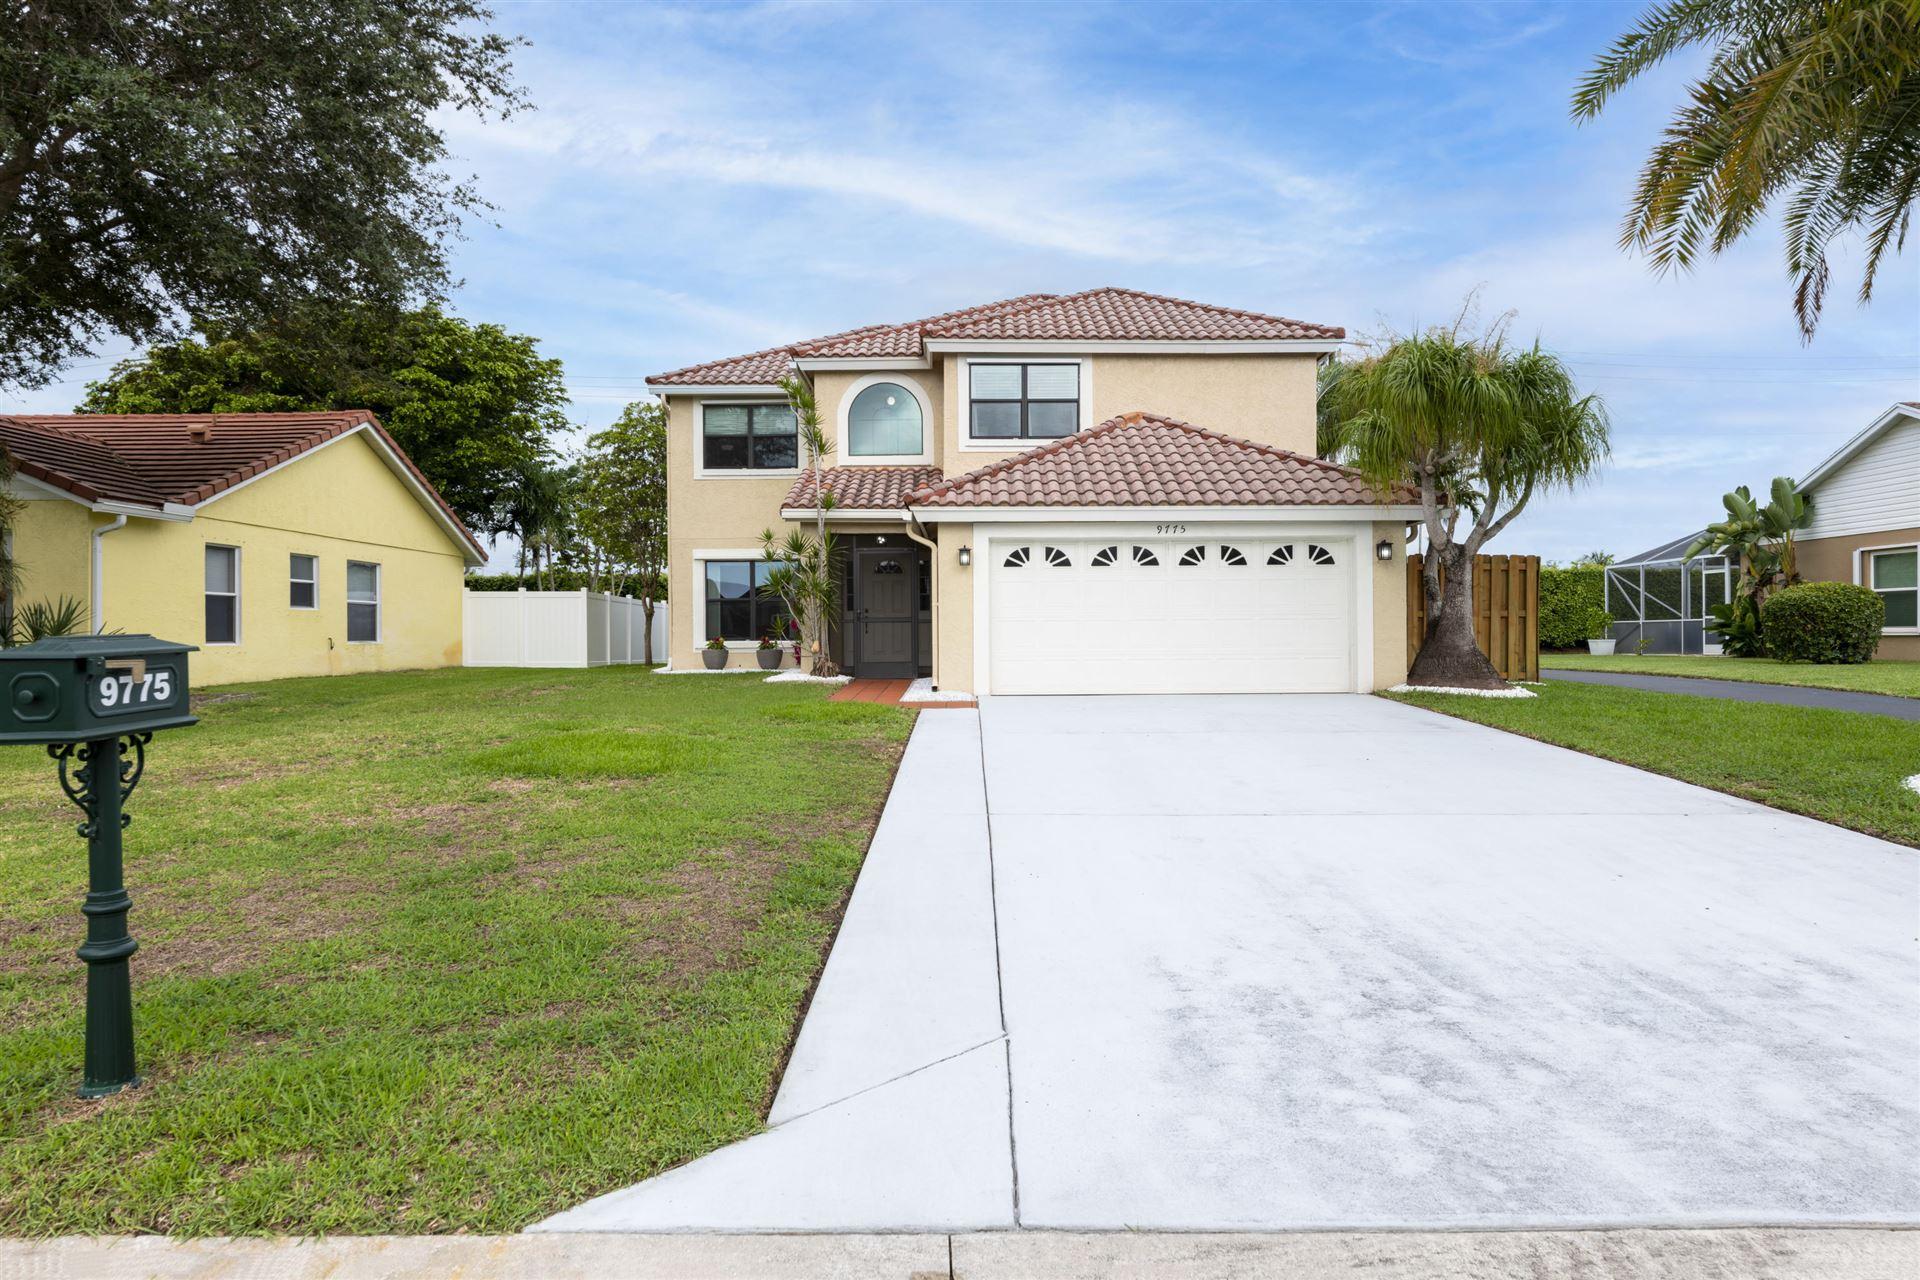 9775 Arbor Meadow Drive, Boynton Beach, FL 33437 - MLS#: RX-10722751